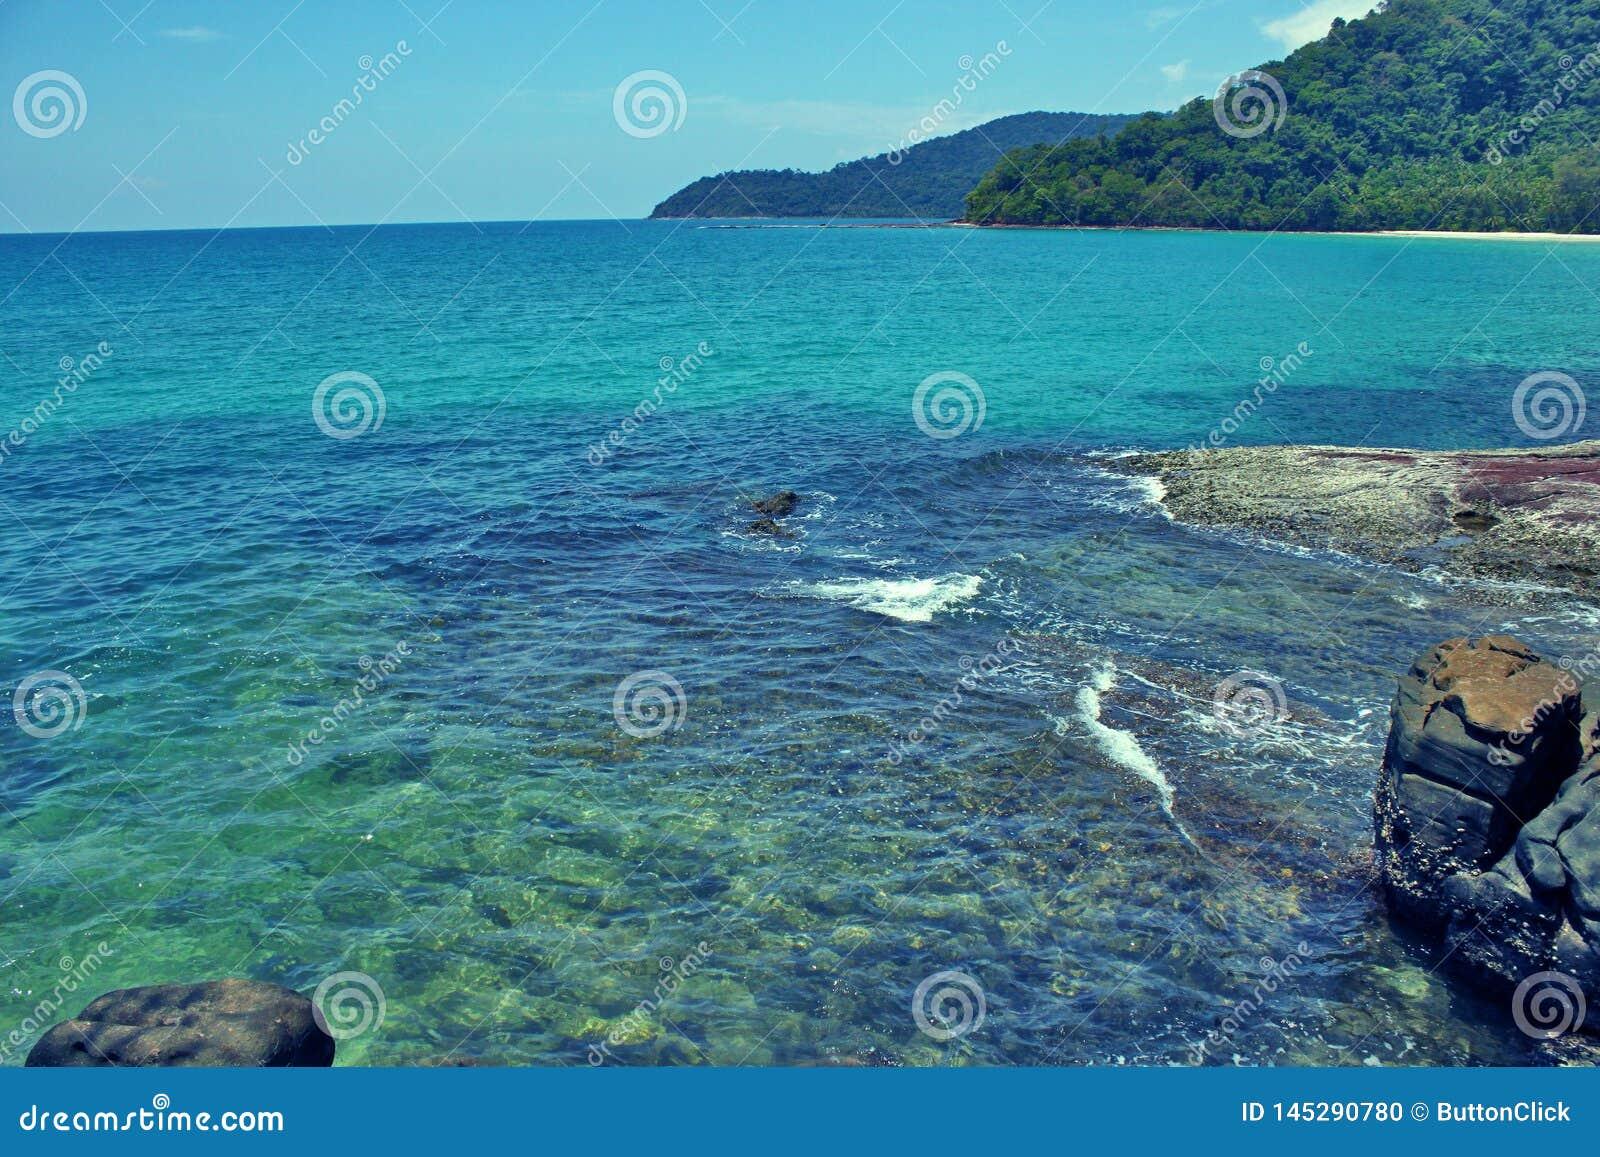 Coral Clear Sea Tropical Wild-Ufer-Berglandschaft